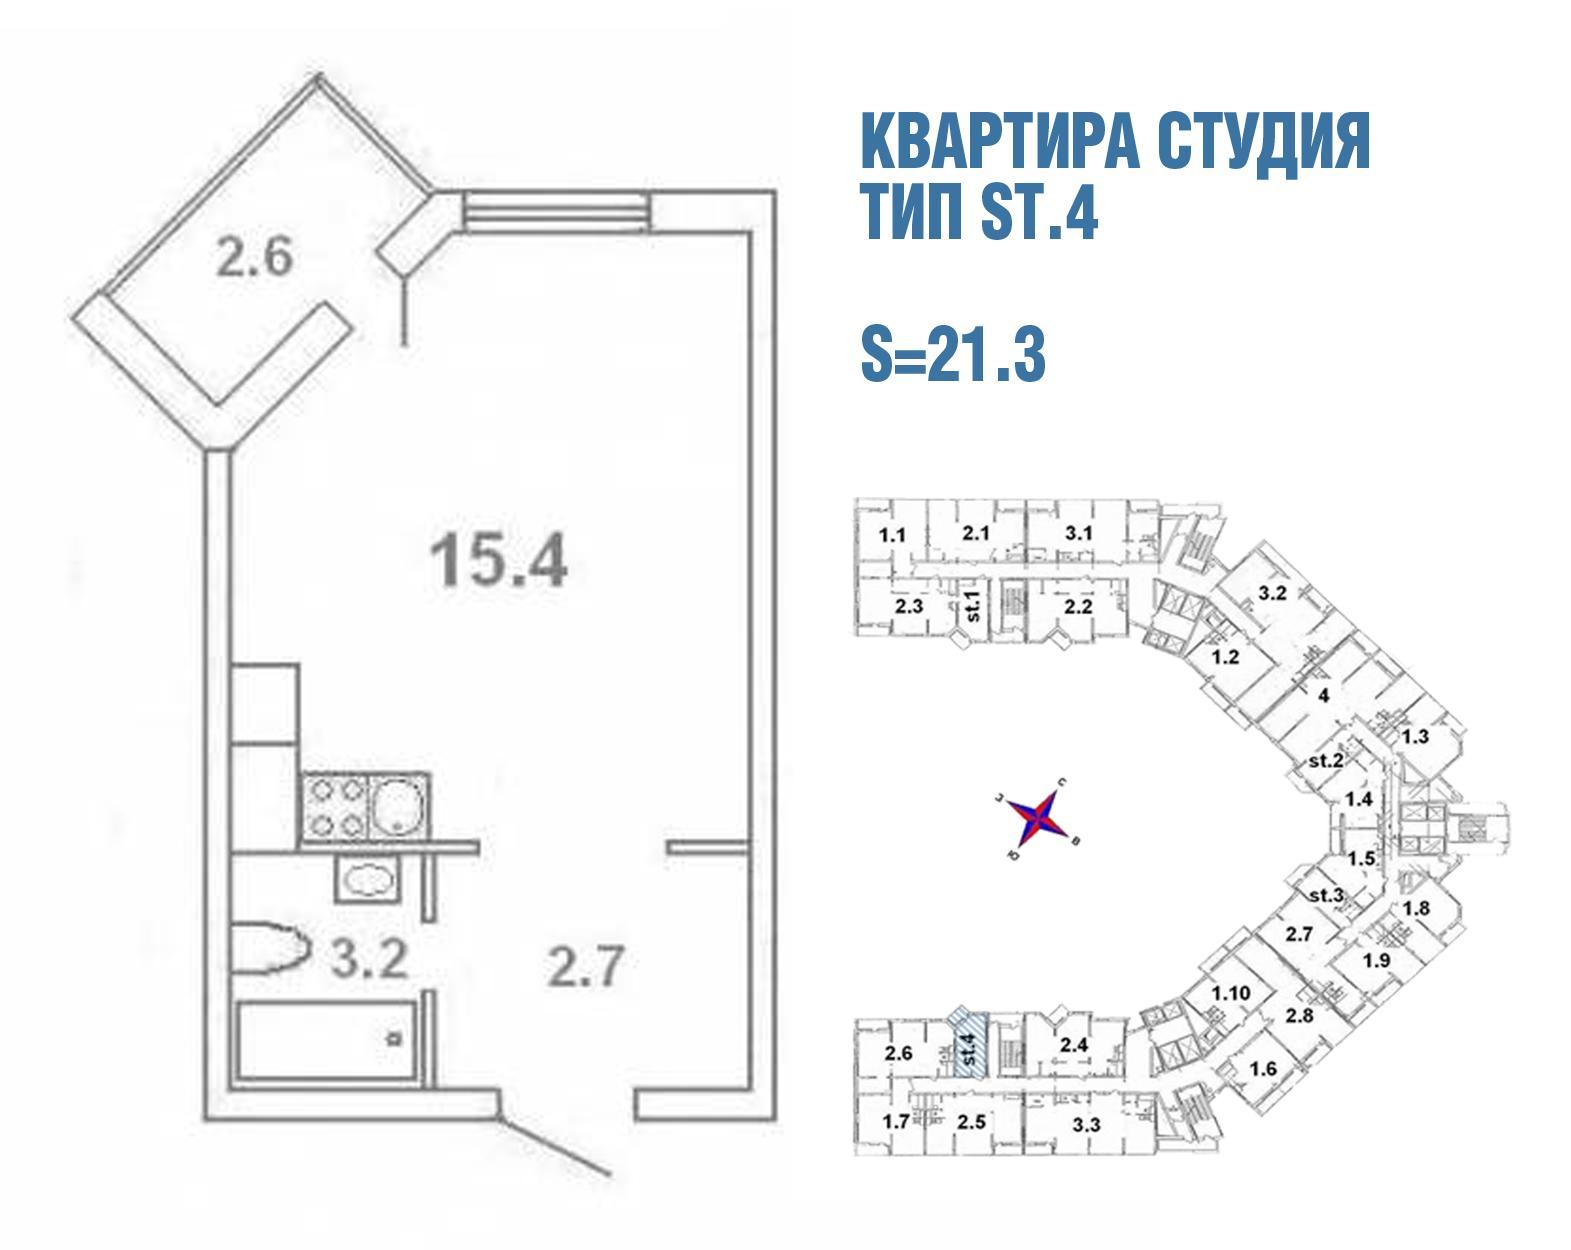 Квартира студия тип st.4 - 21,3 кв.м.